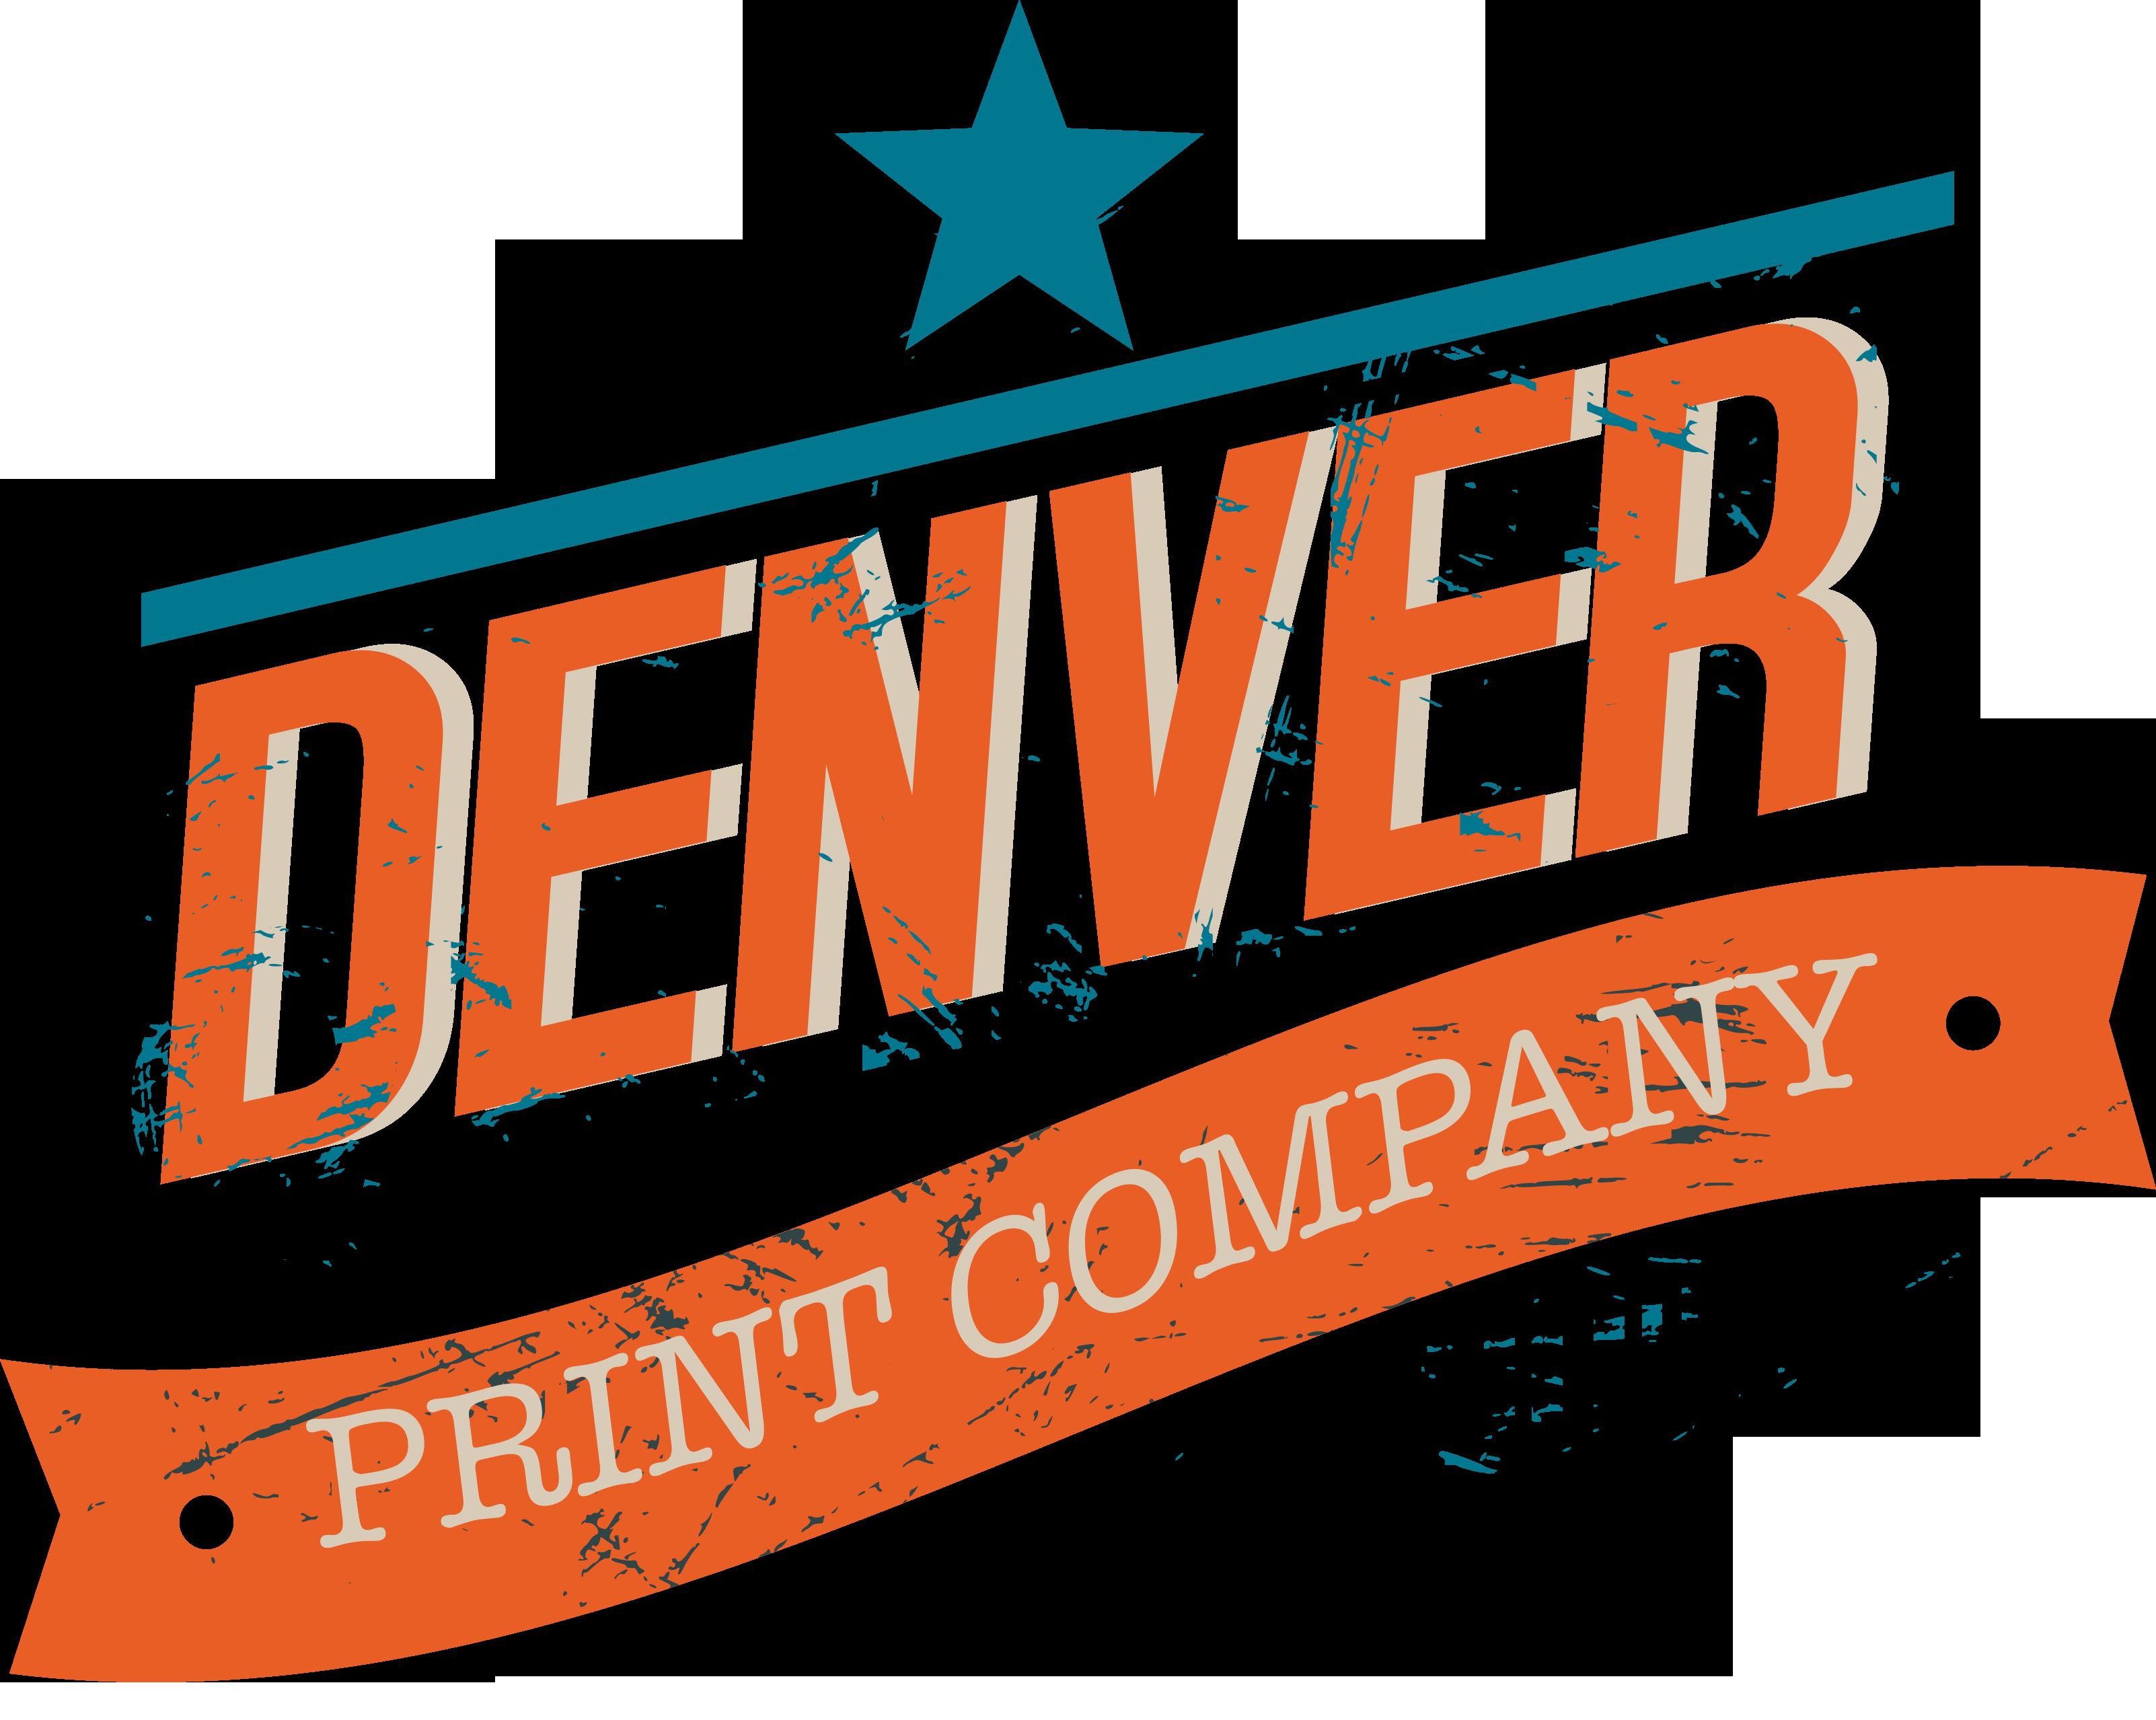 Denver print company logo branding image reheart Gallery